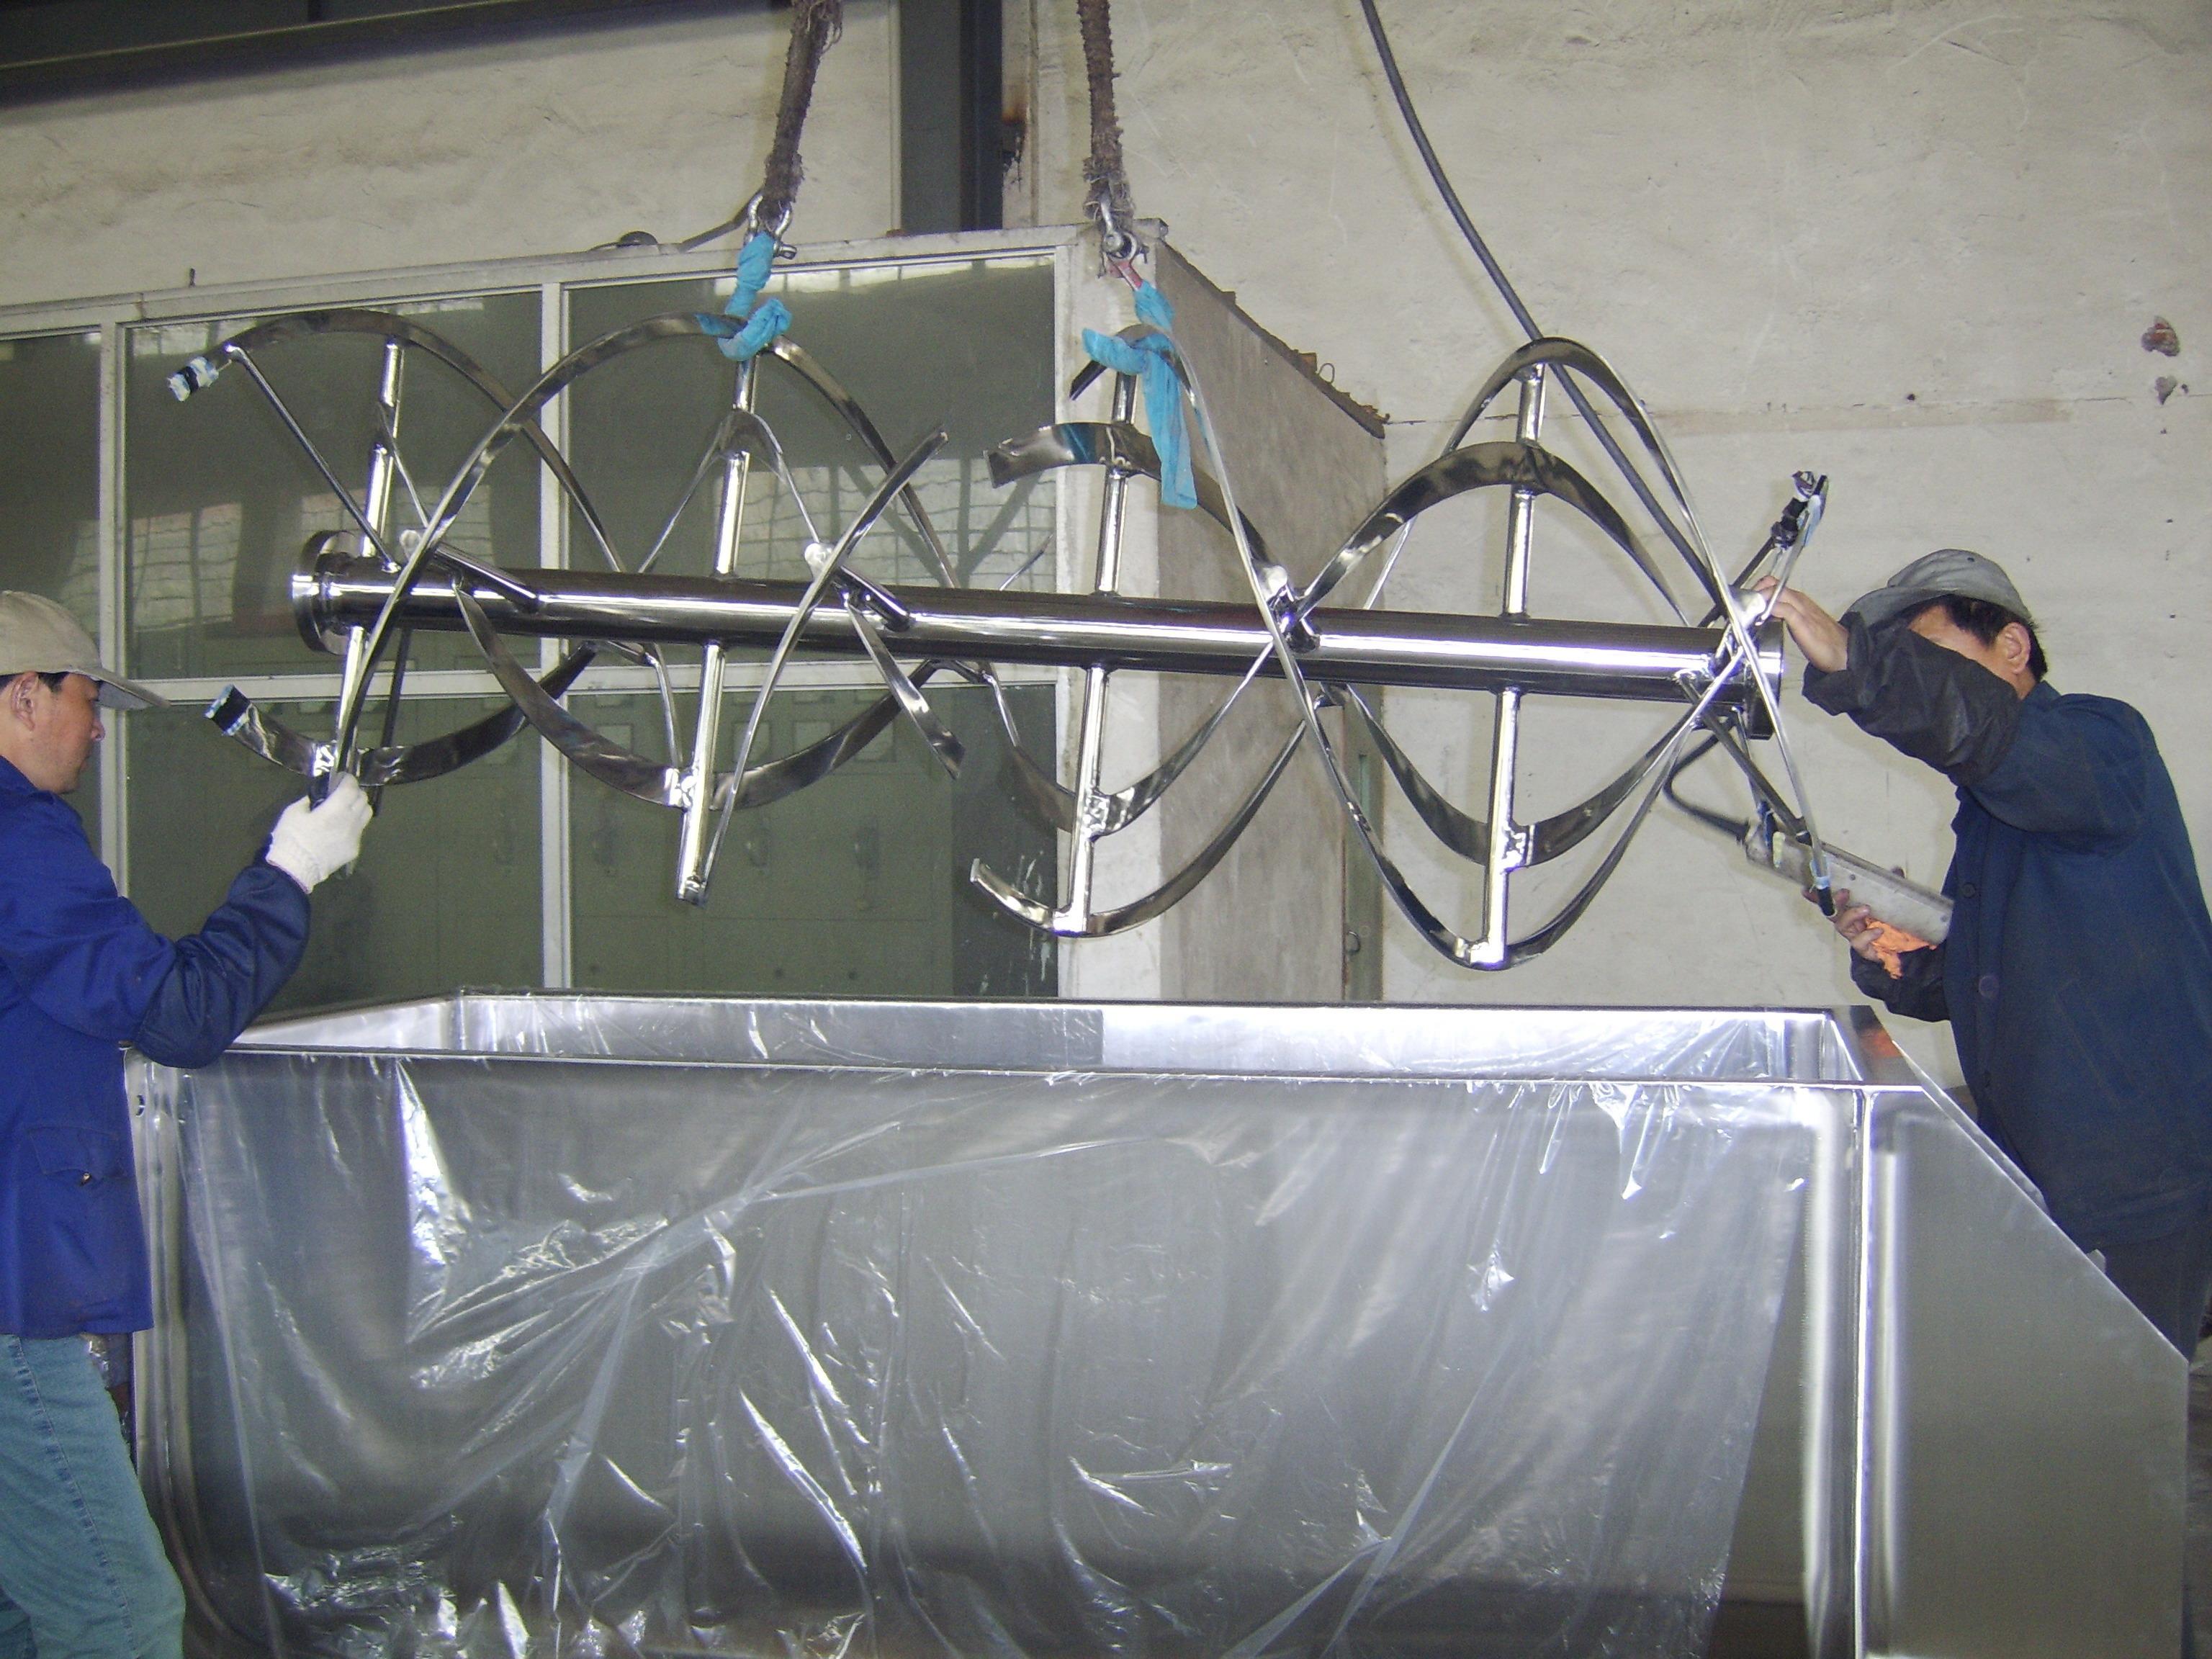 Vortex Mixing Technology Developed Removable Ribbon Shaft